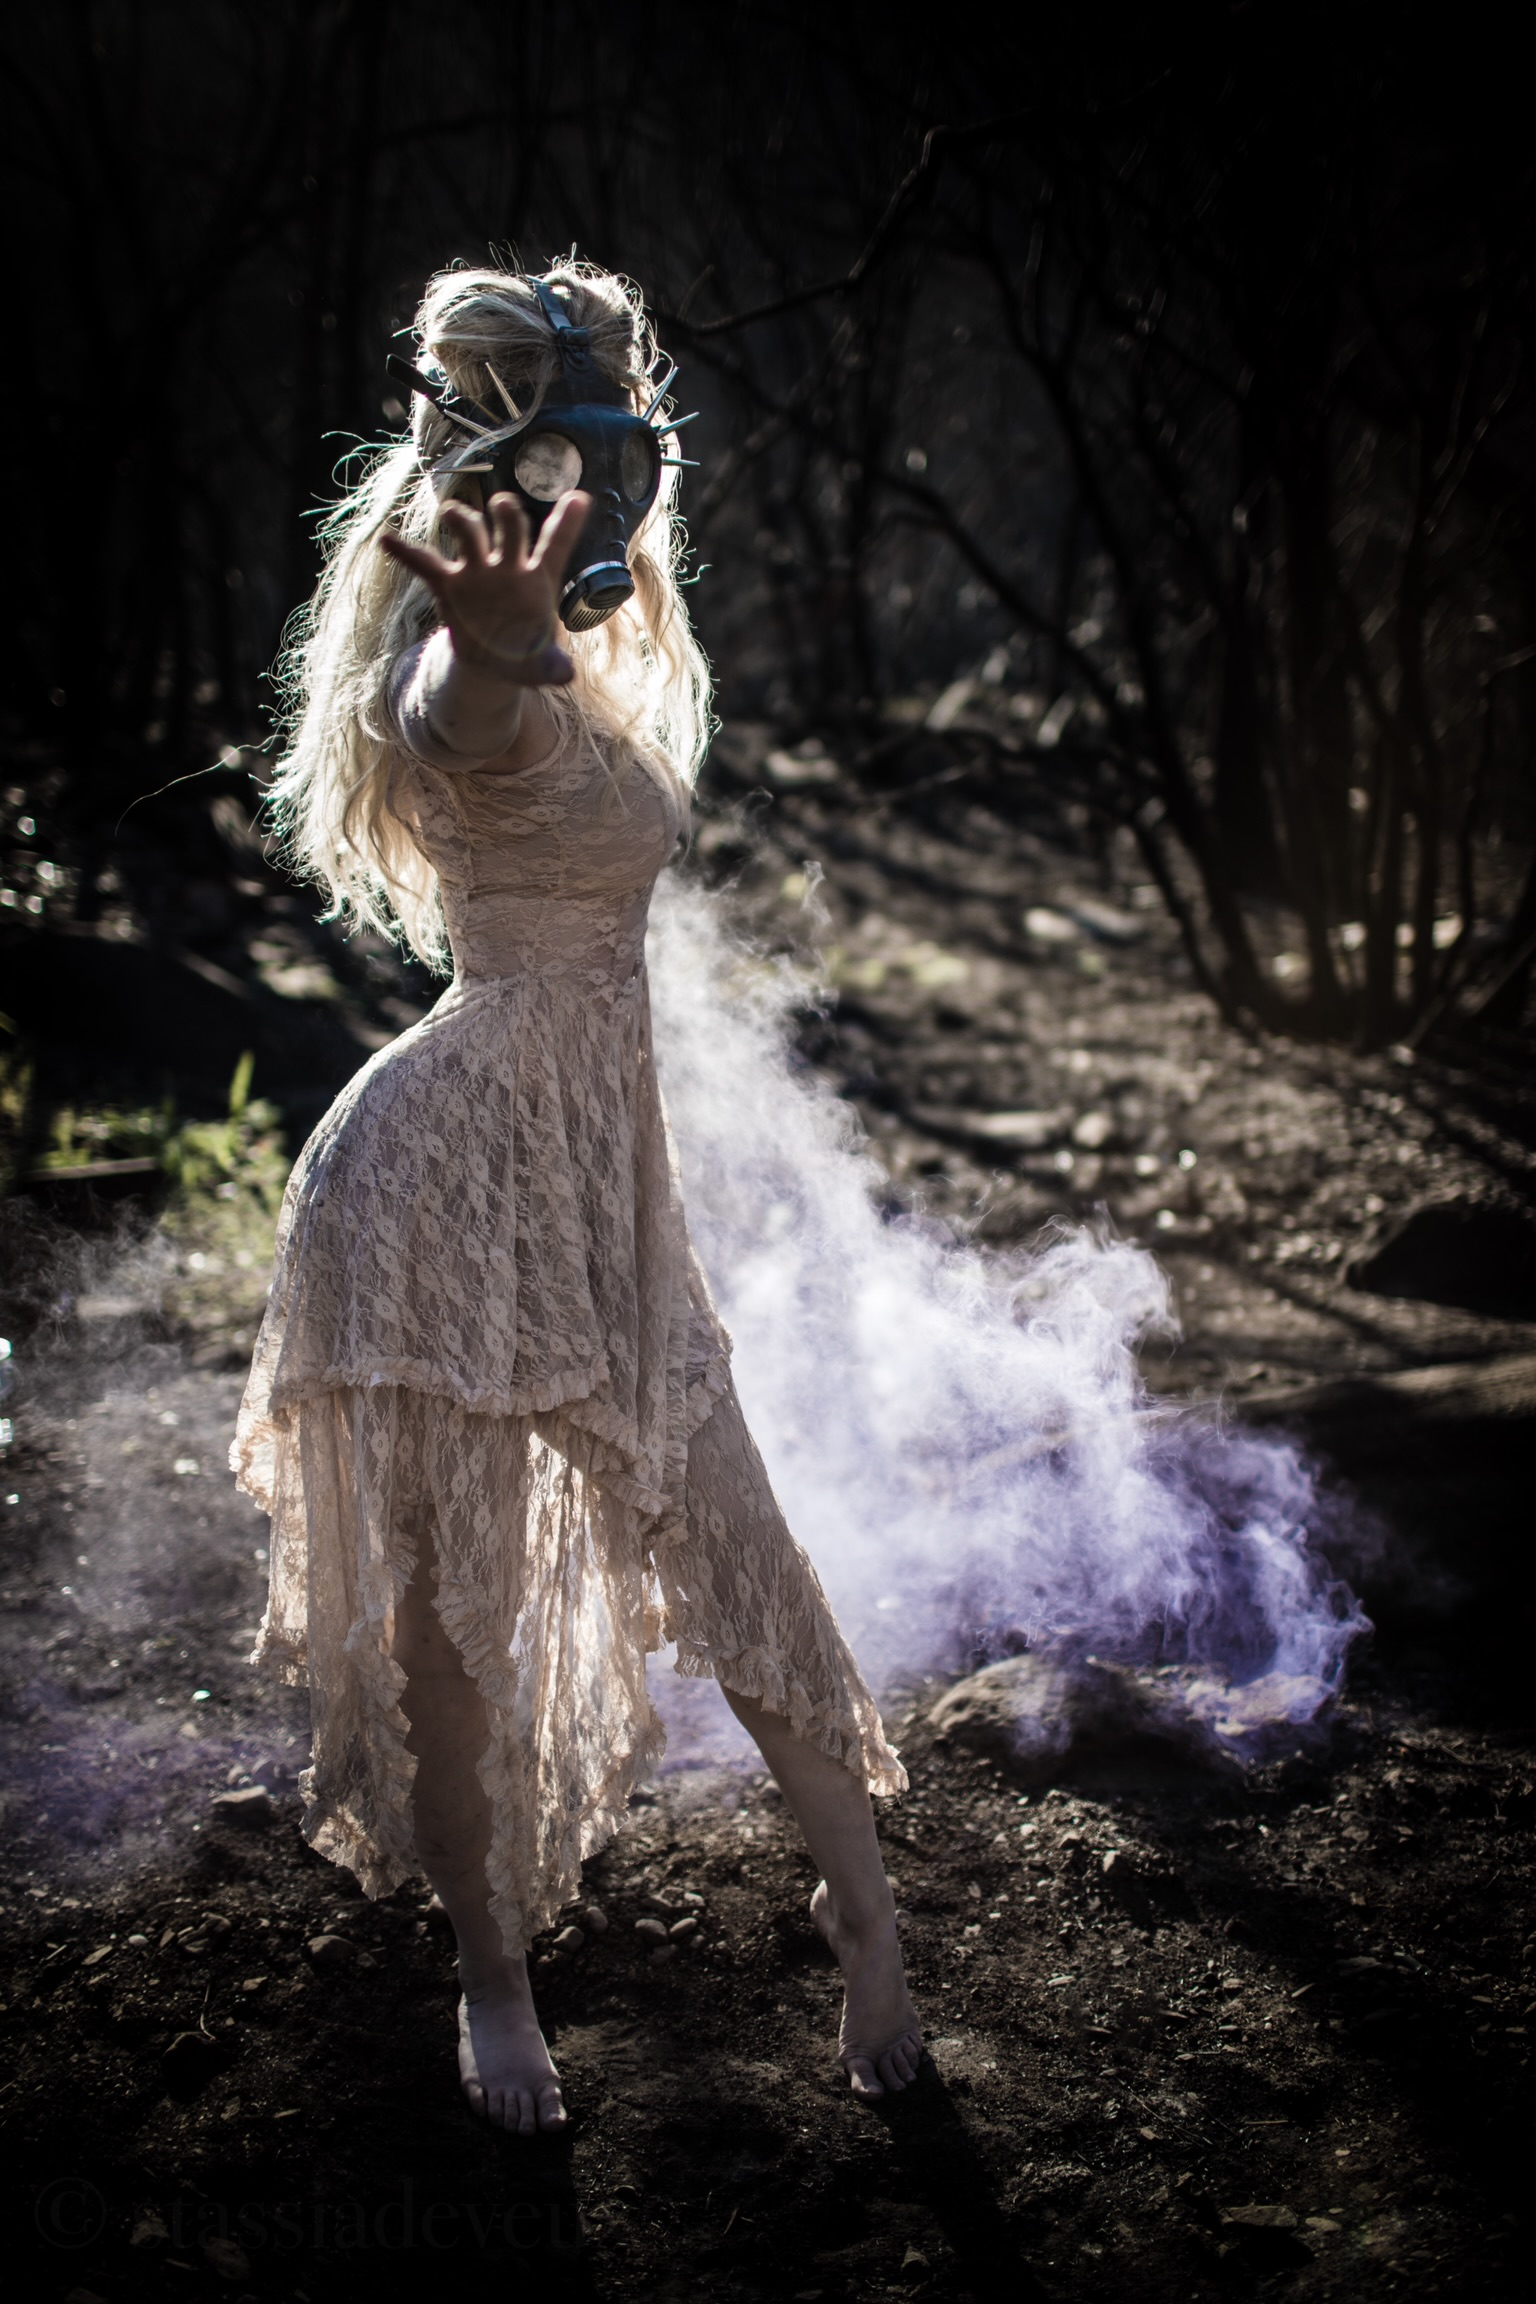 https://Www.instagram.com/aesthetic_disorder_photography